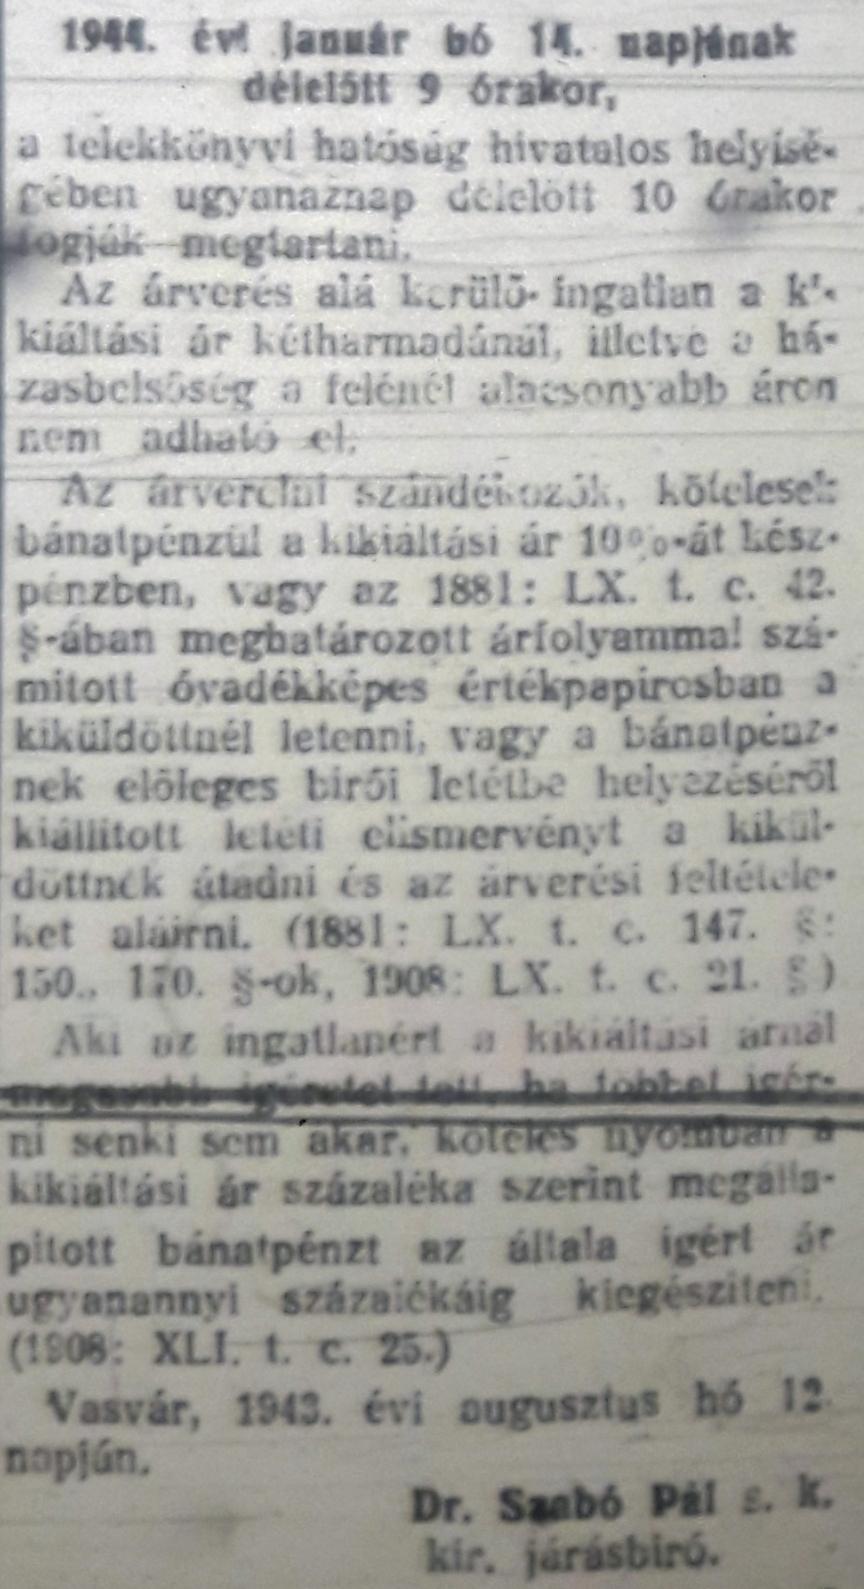 vasvarmegye_19431221_8o_2.jpg